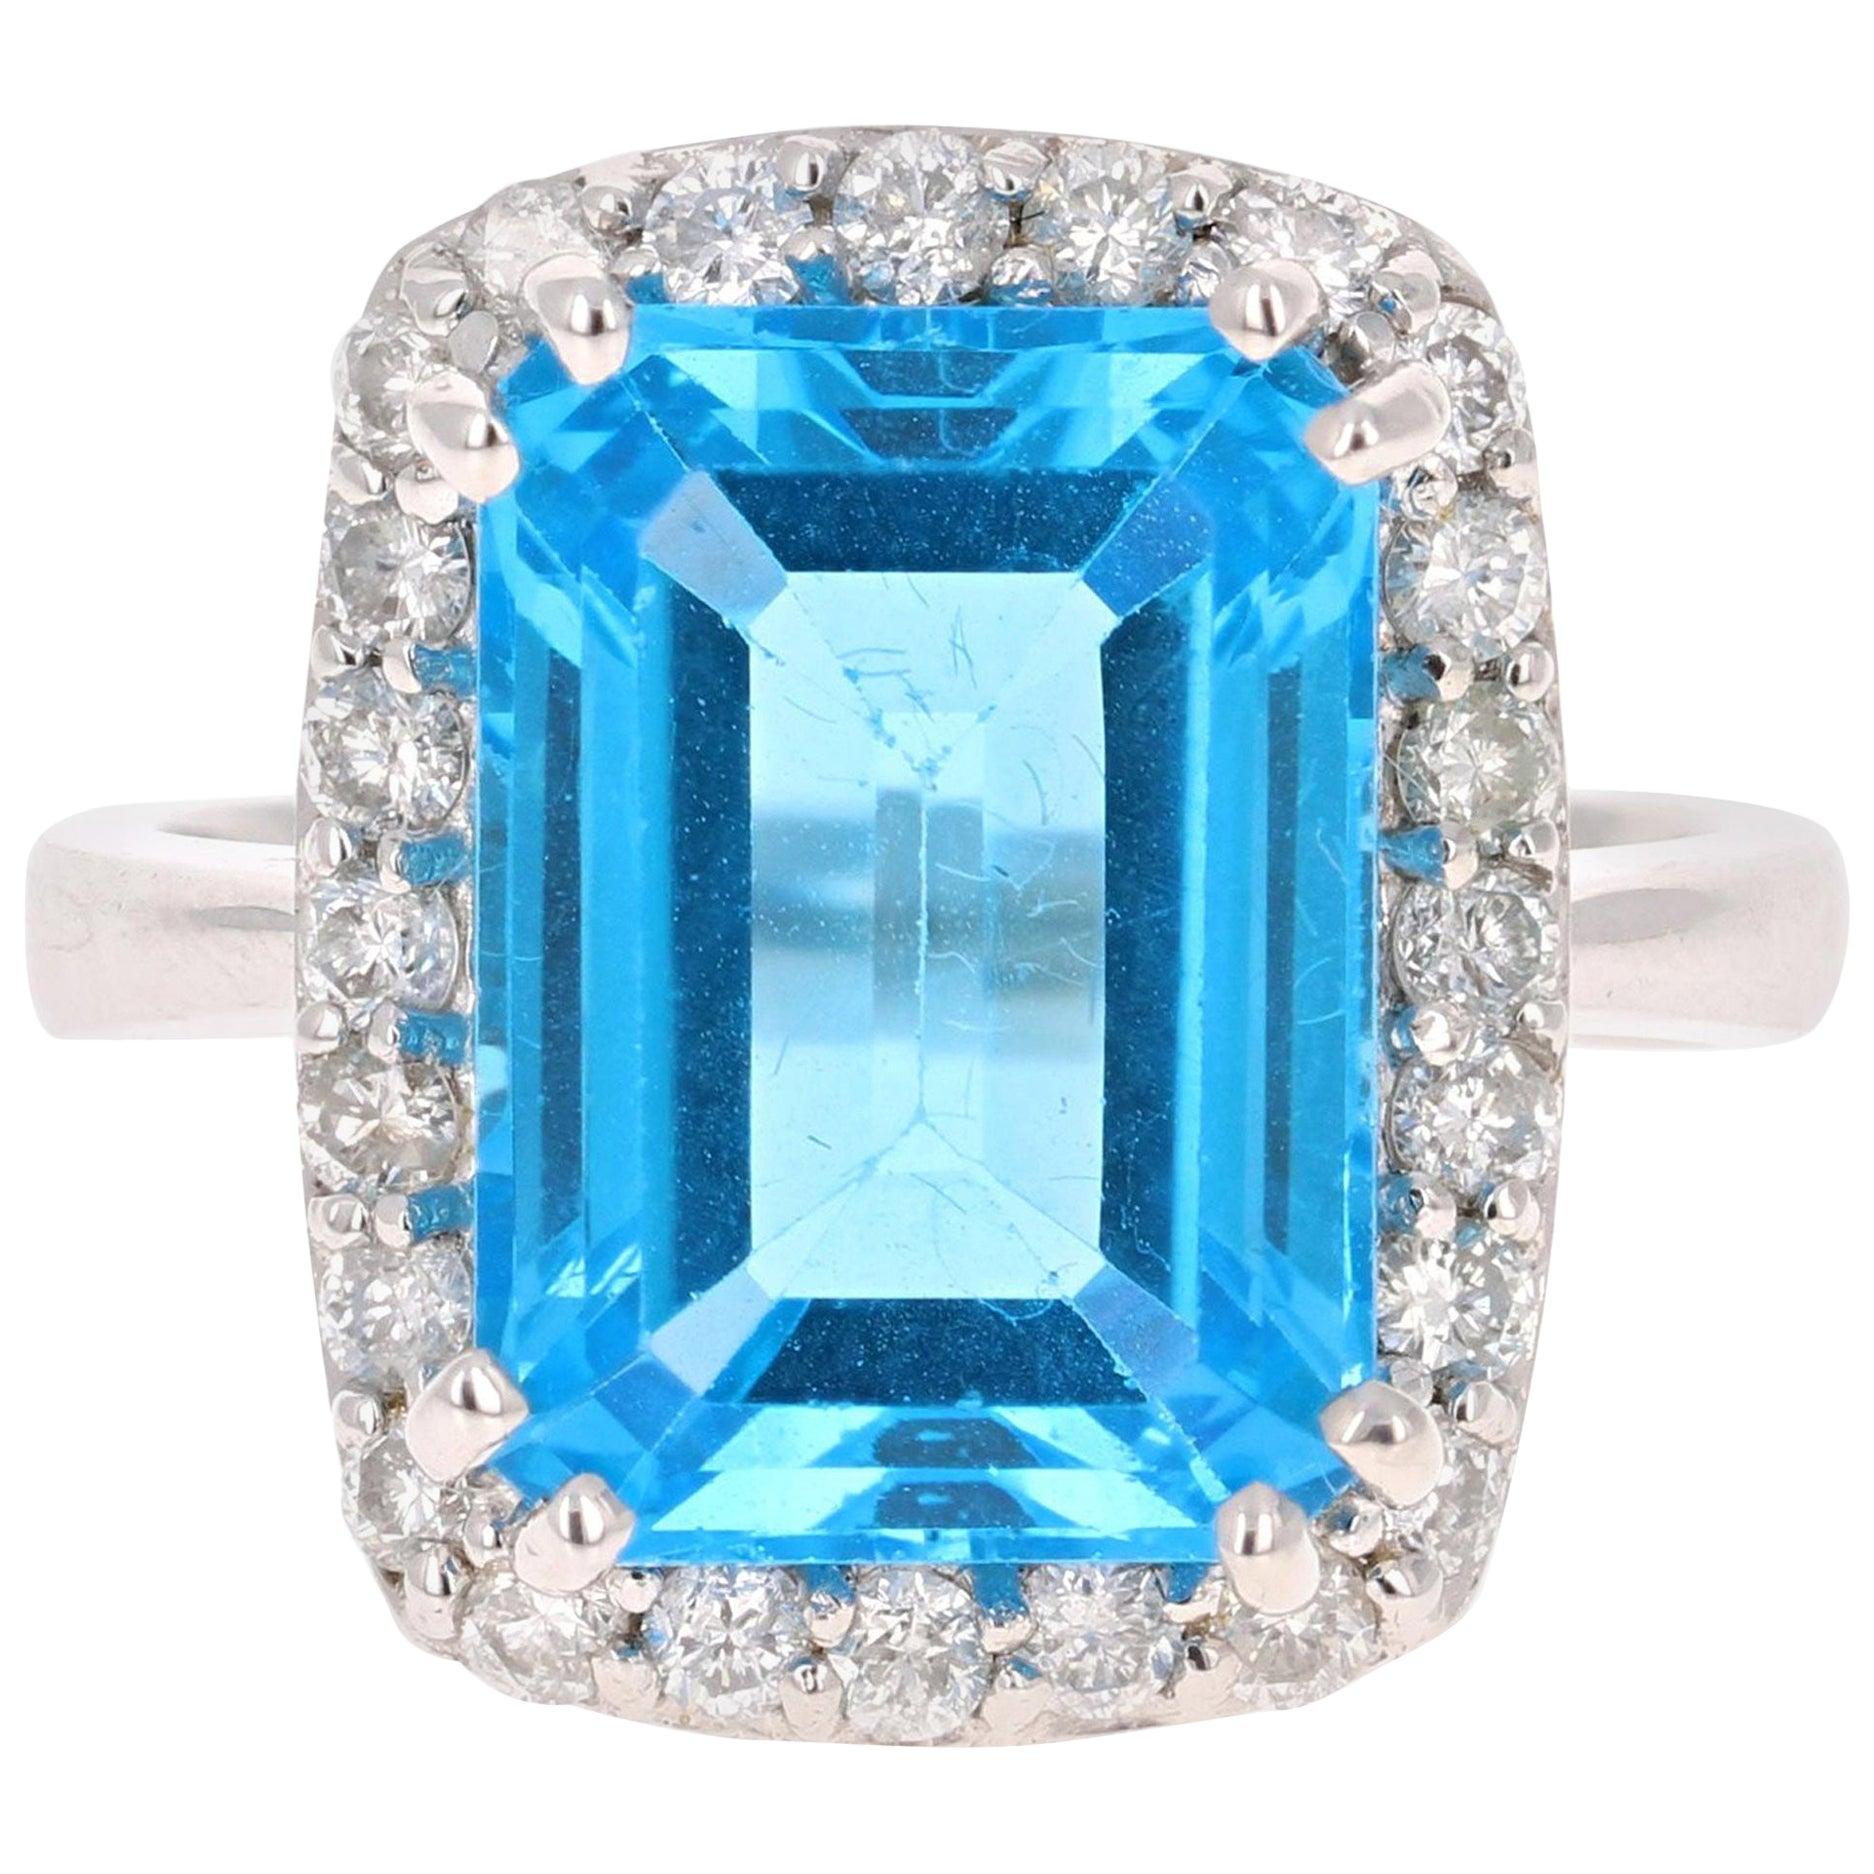 9.88 Carat Blue Topaz Diamond White Gold Cocktail Ring